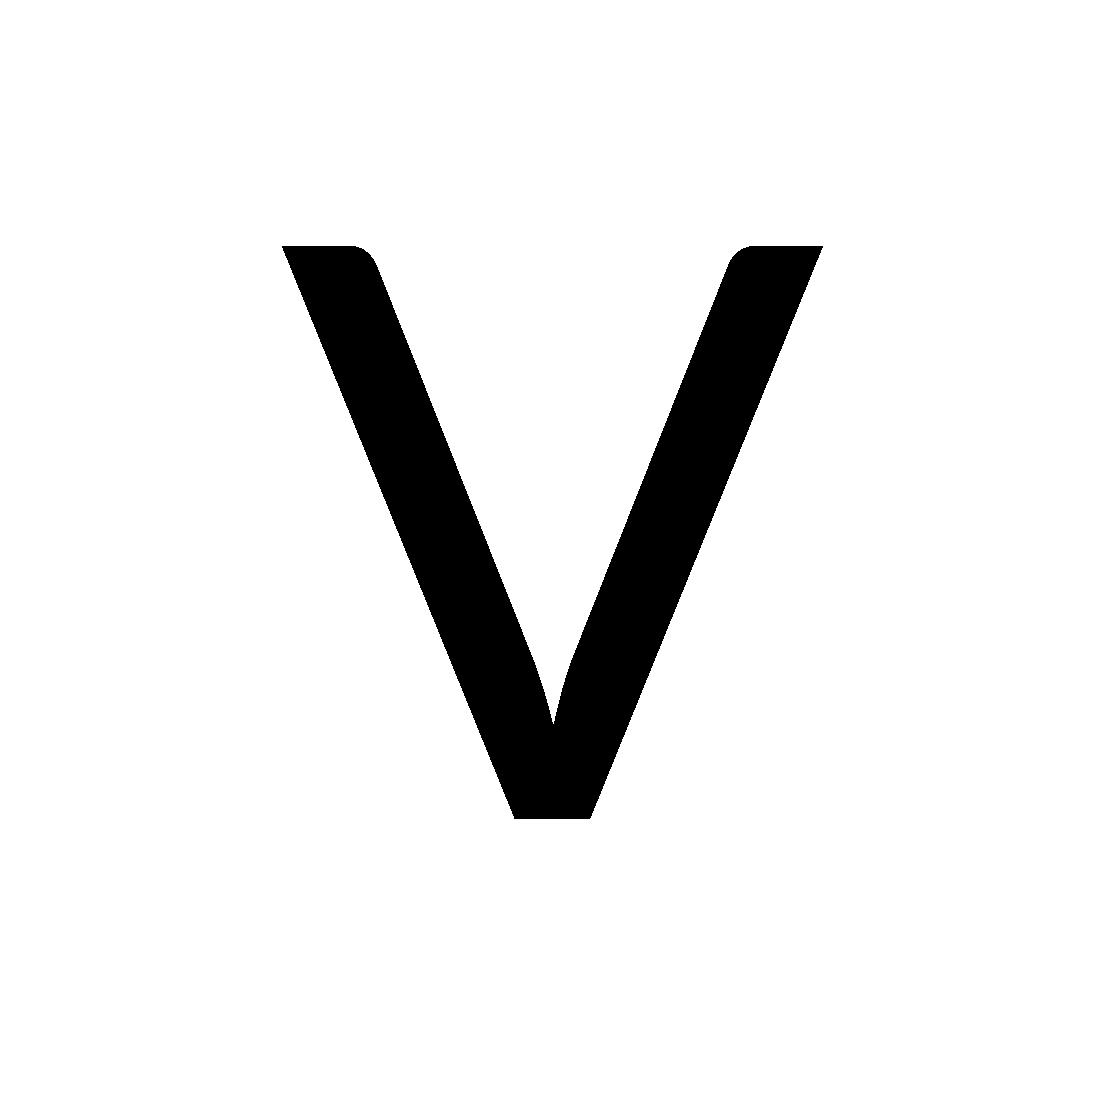 Lettre V transparante